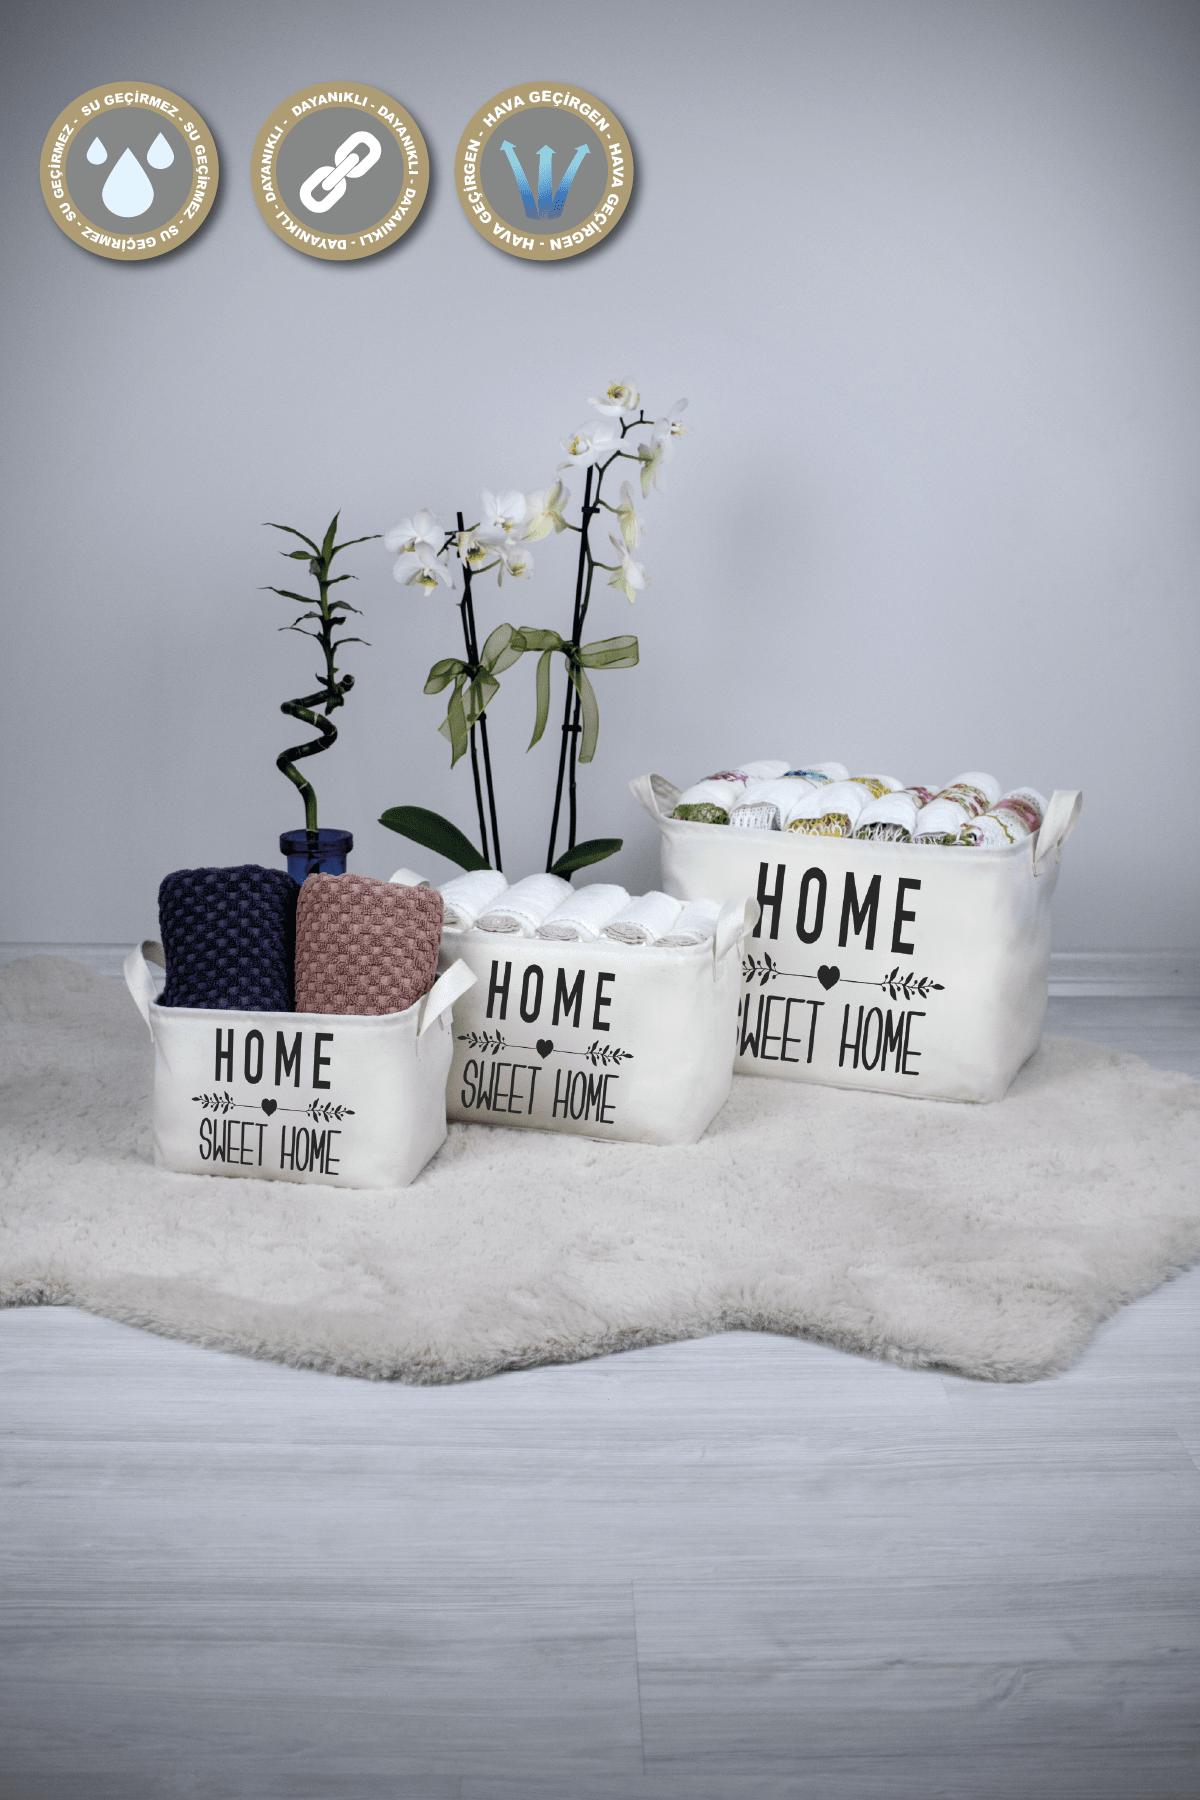 Rope Home Beyaz Home Sweet Home Dikdörtgen Sepet 15x25x18 47-01 Beyaz 47-01